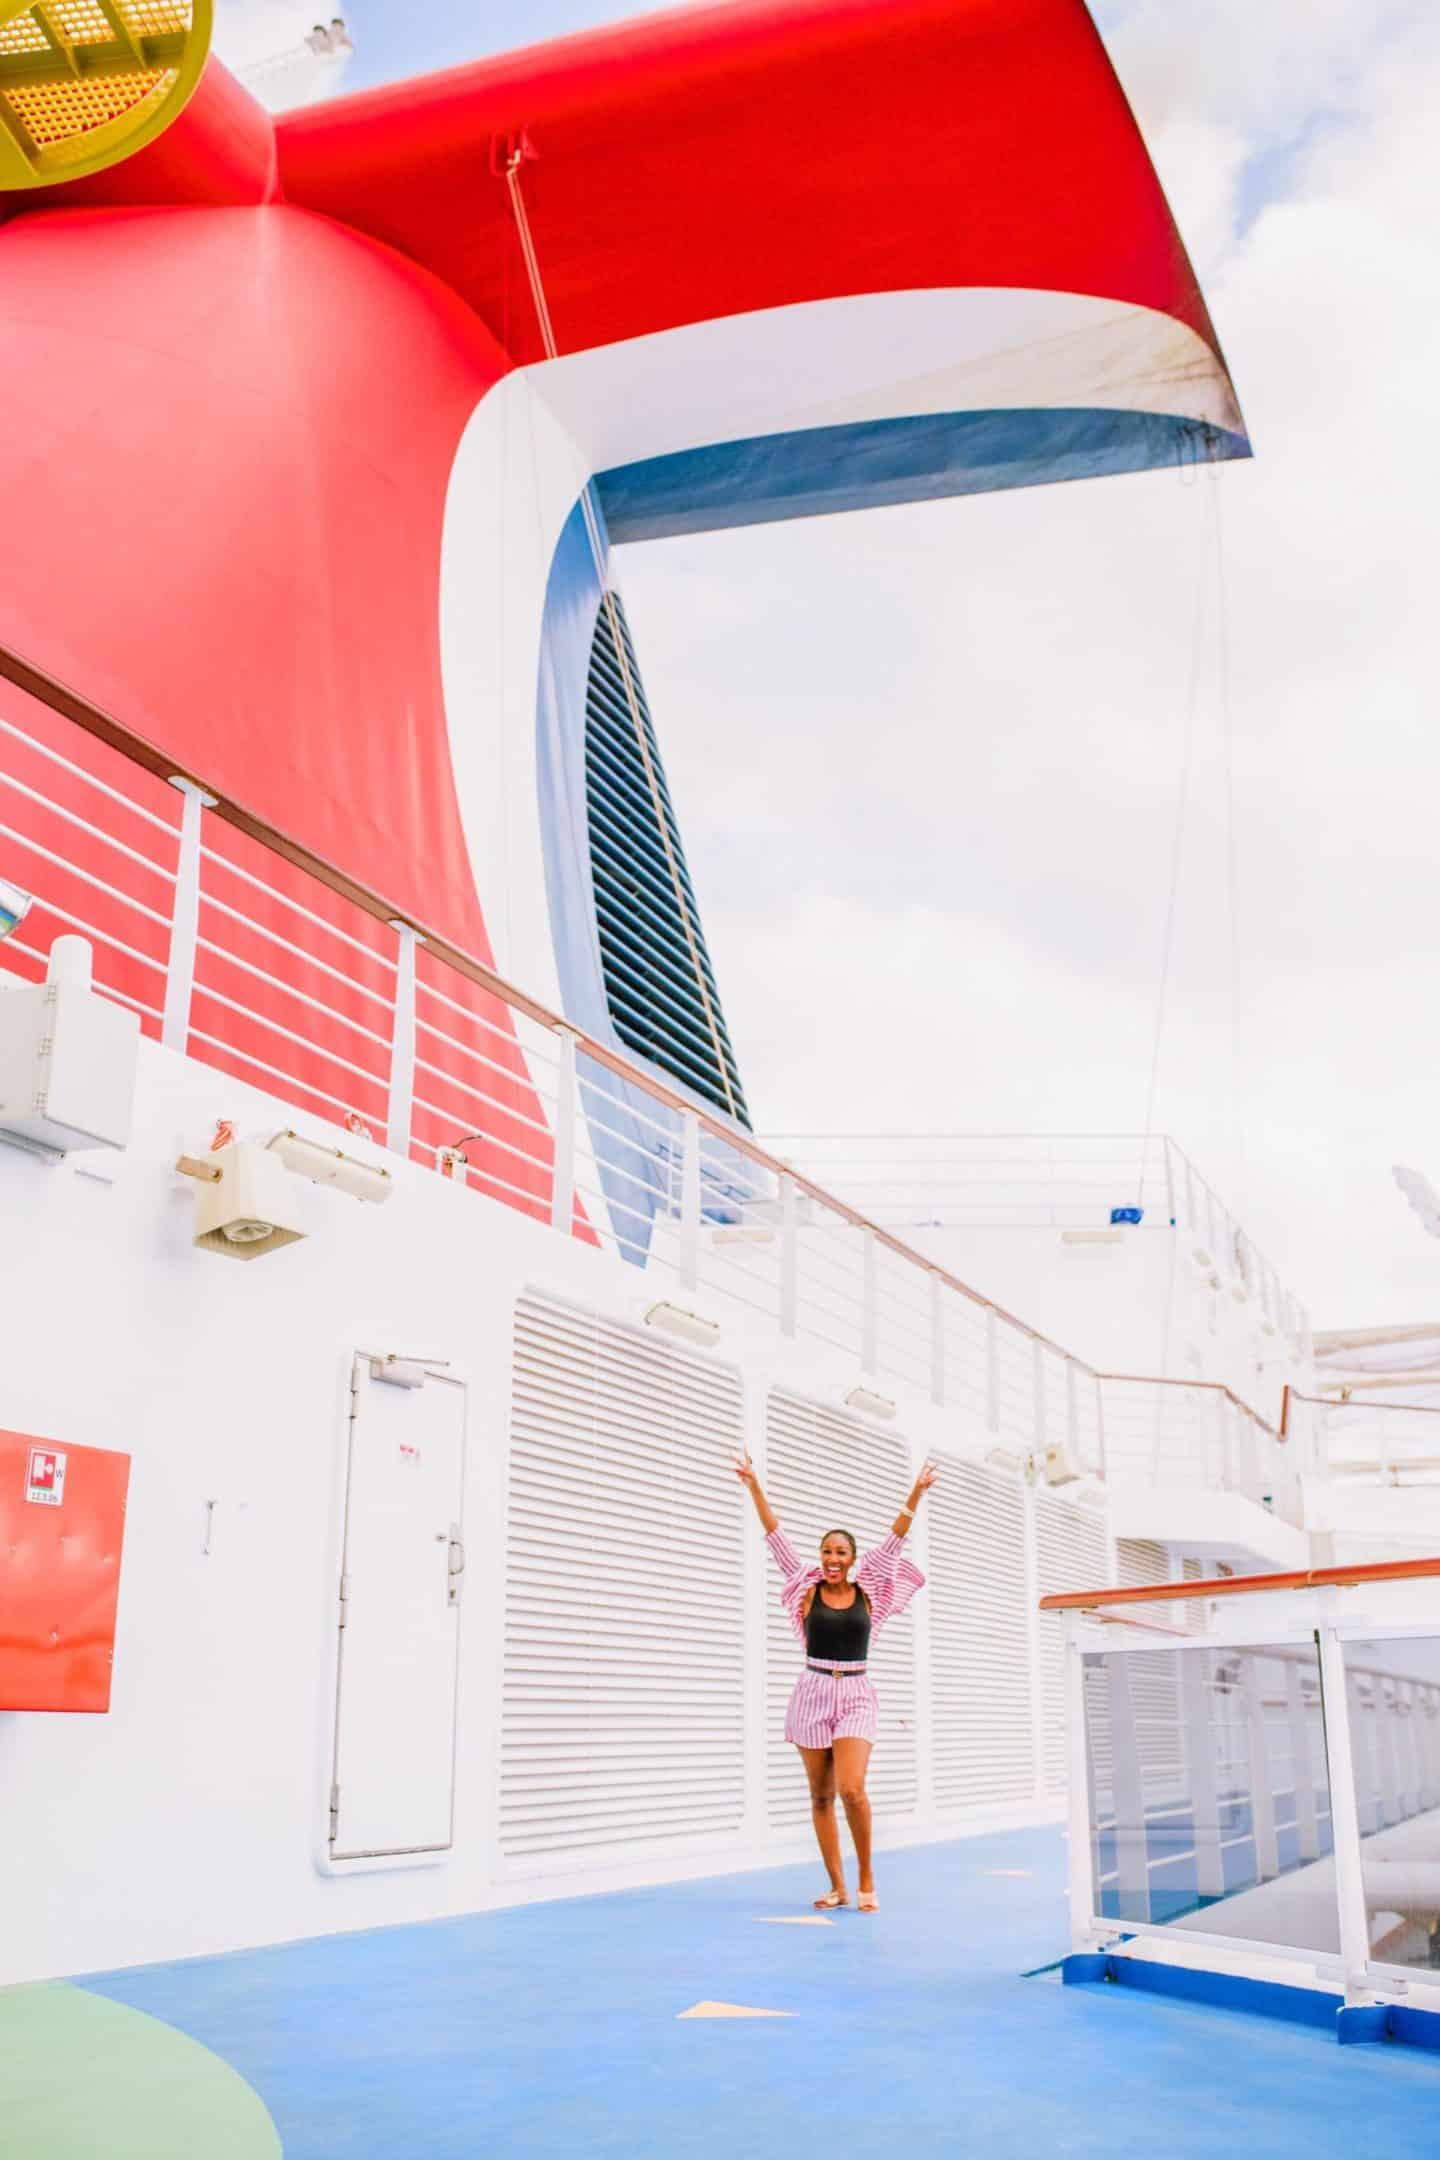 Carnival cruise ship Vista whale tail funnel